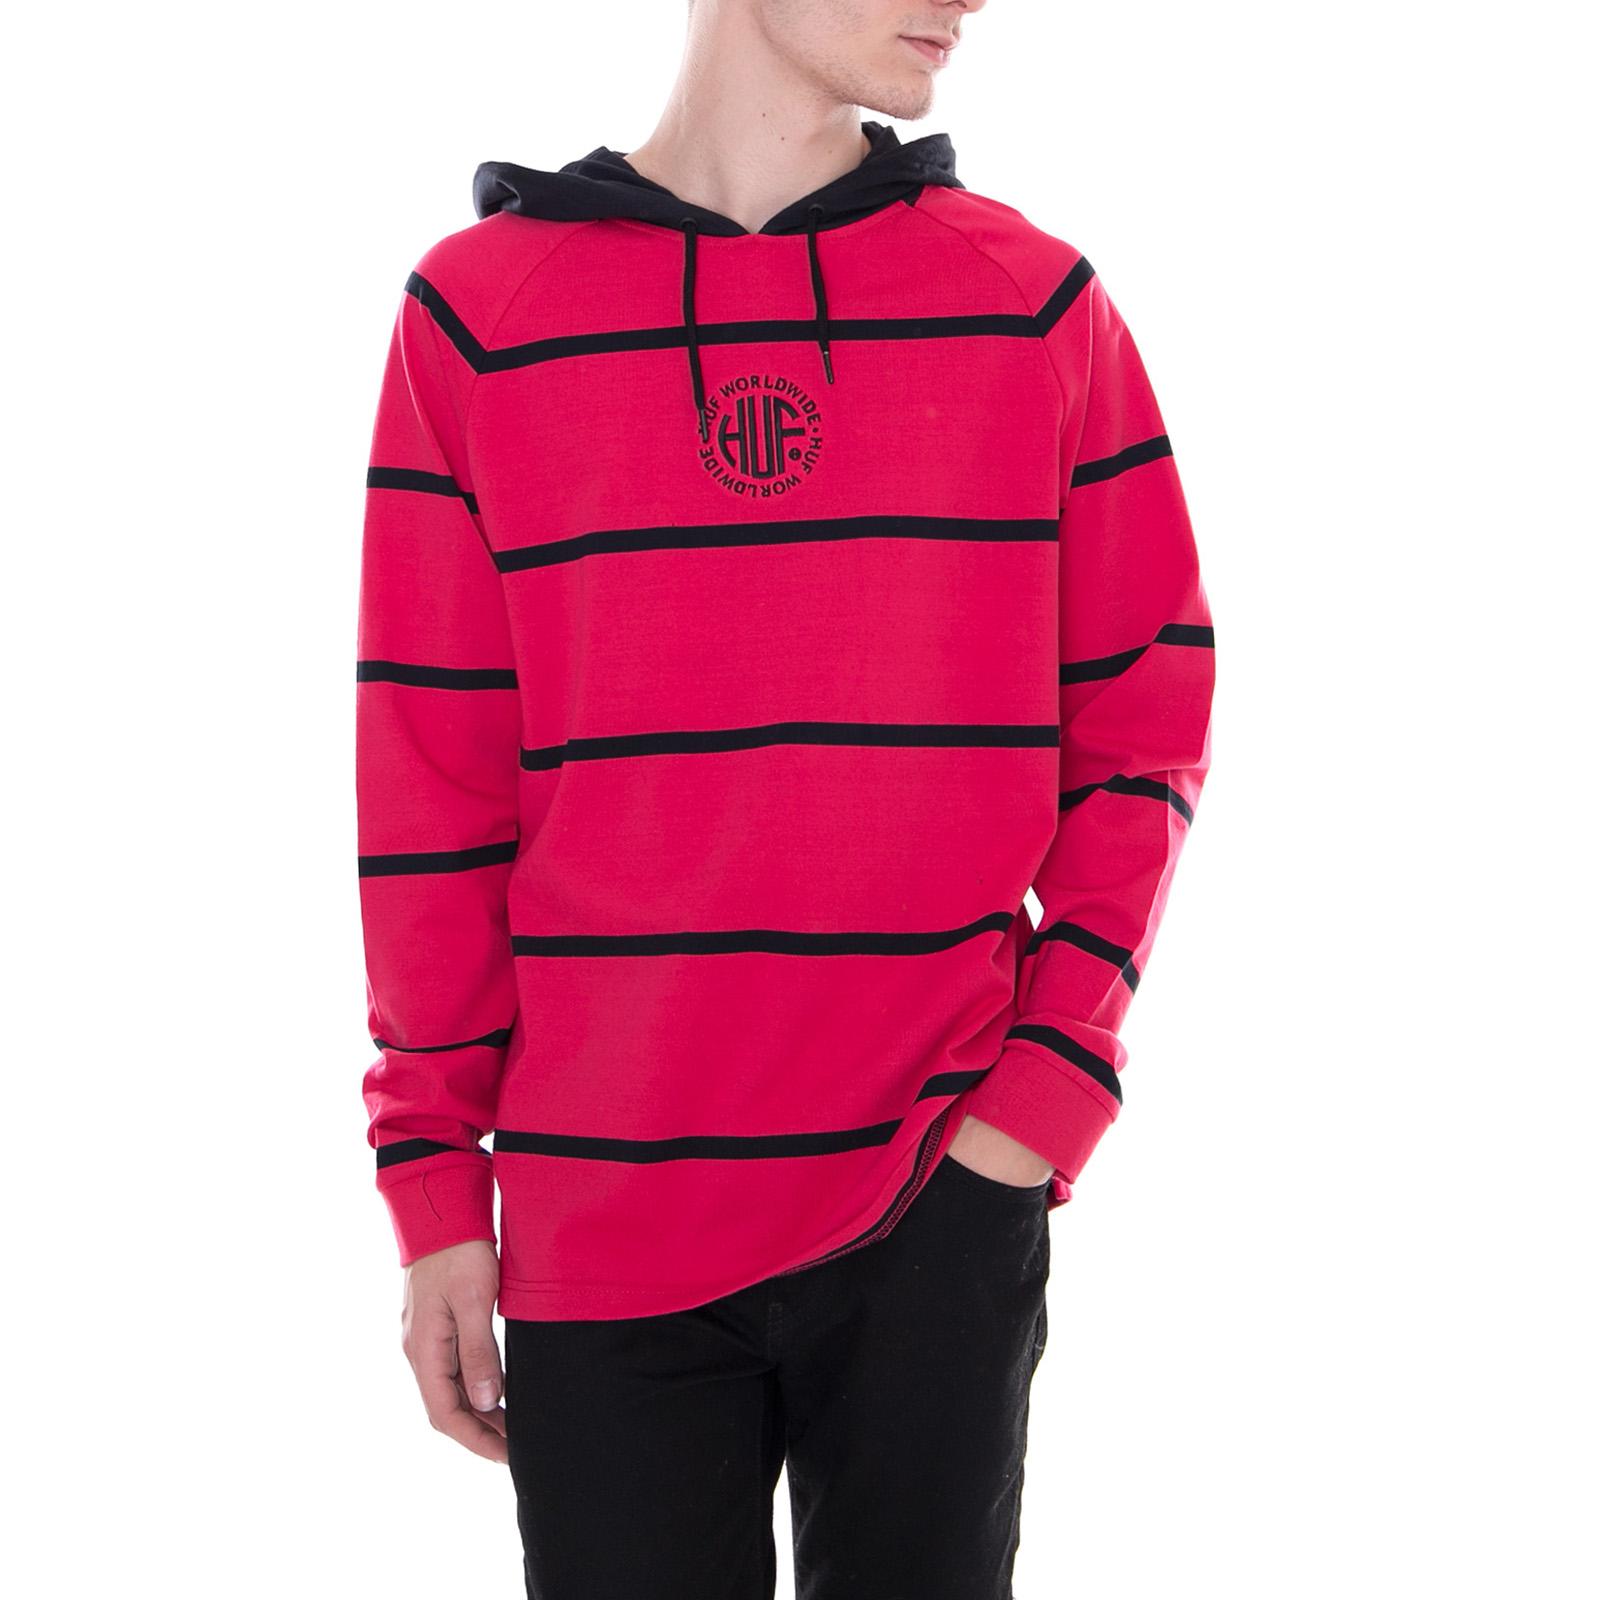 zwart Huf Rood Knit Transit Scarlet Violet Top Sweatshirts wCxAv7Yq